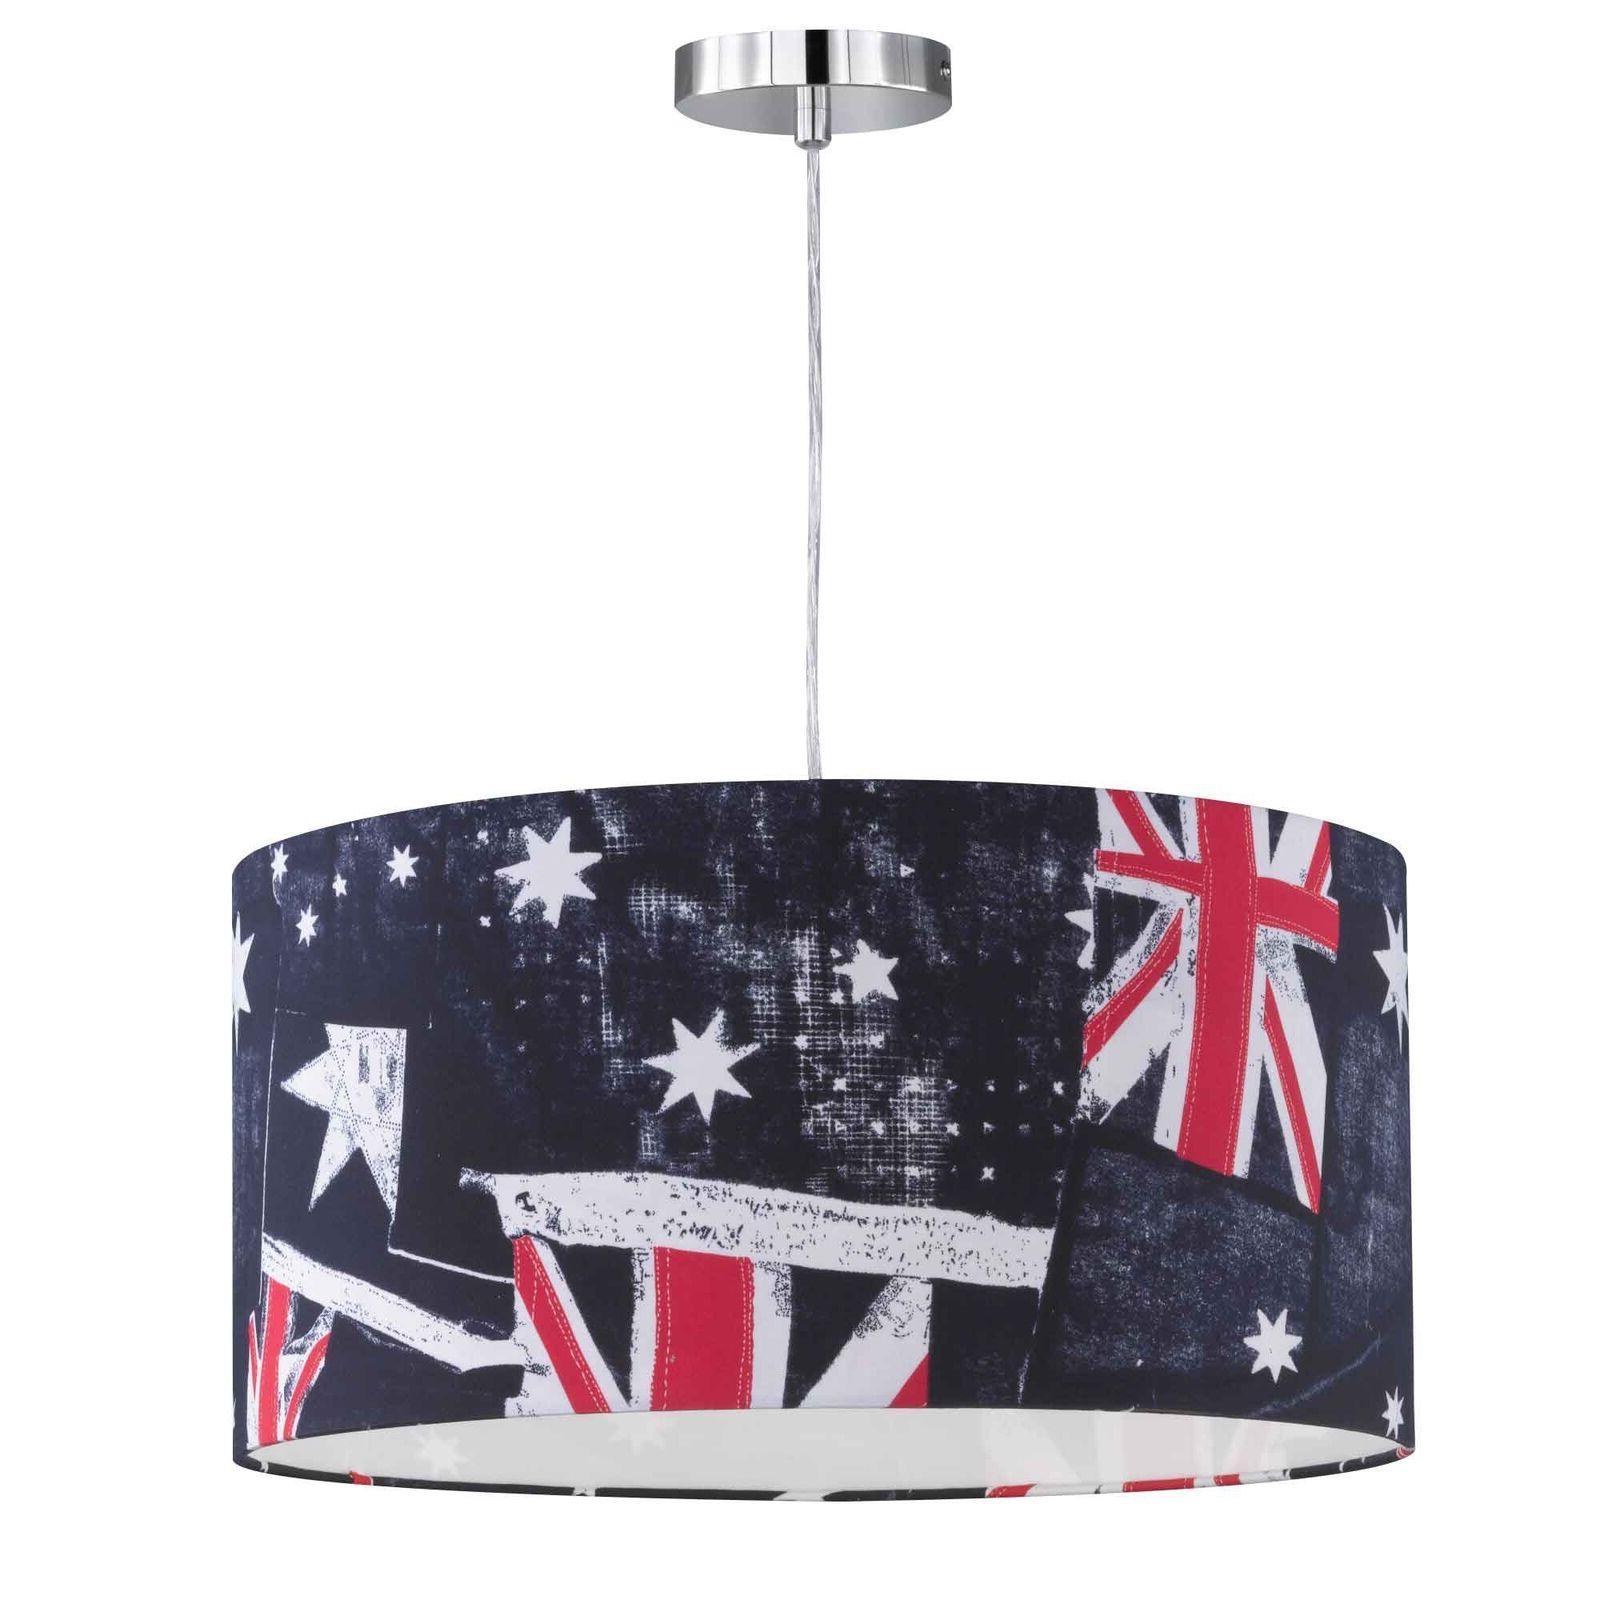 luminaire suspendu banniere drapeau decor lampe chromee